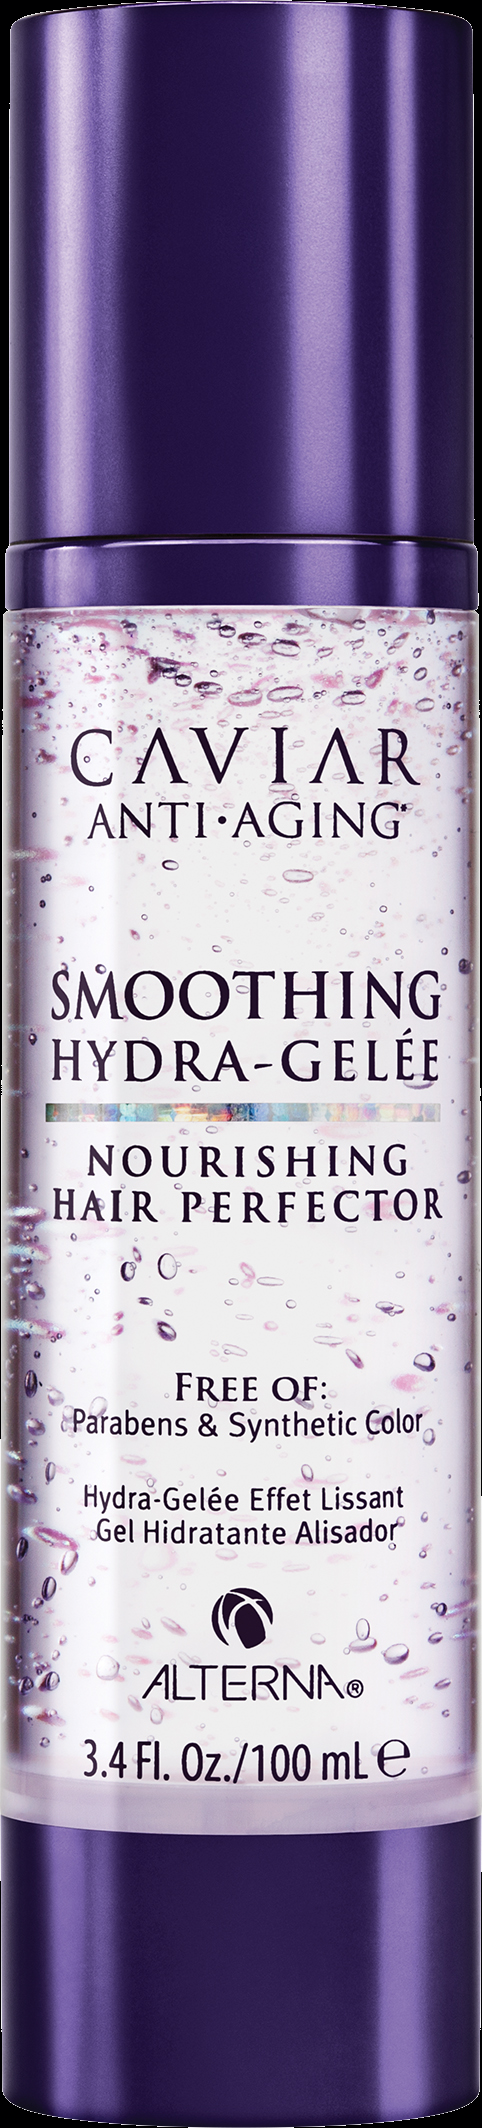 ALTERNA Гель-идеализатор разглаживающий для увлажнения и питания / Anti-Aging Smoothing Hydra-Gelee Nourishing Hair Perfector CAVIAR 100 мл -  Гели